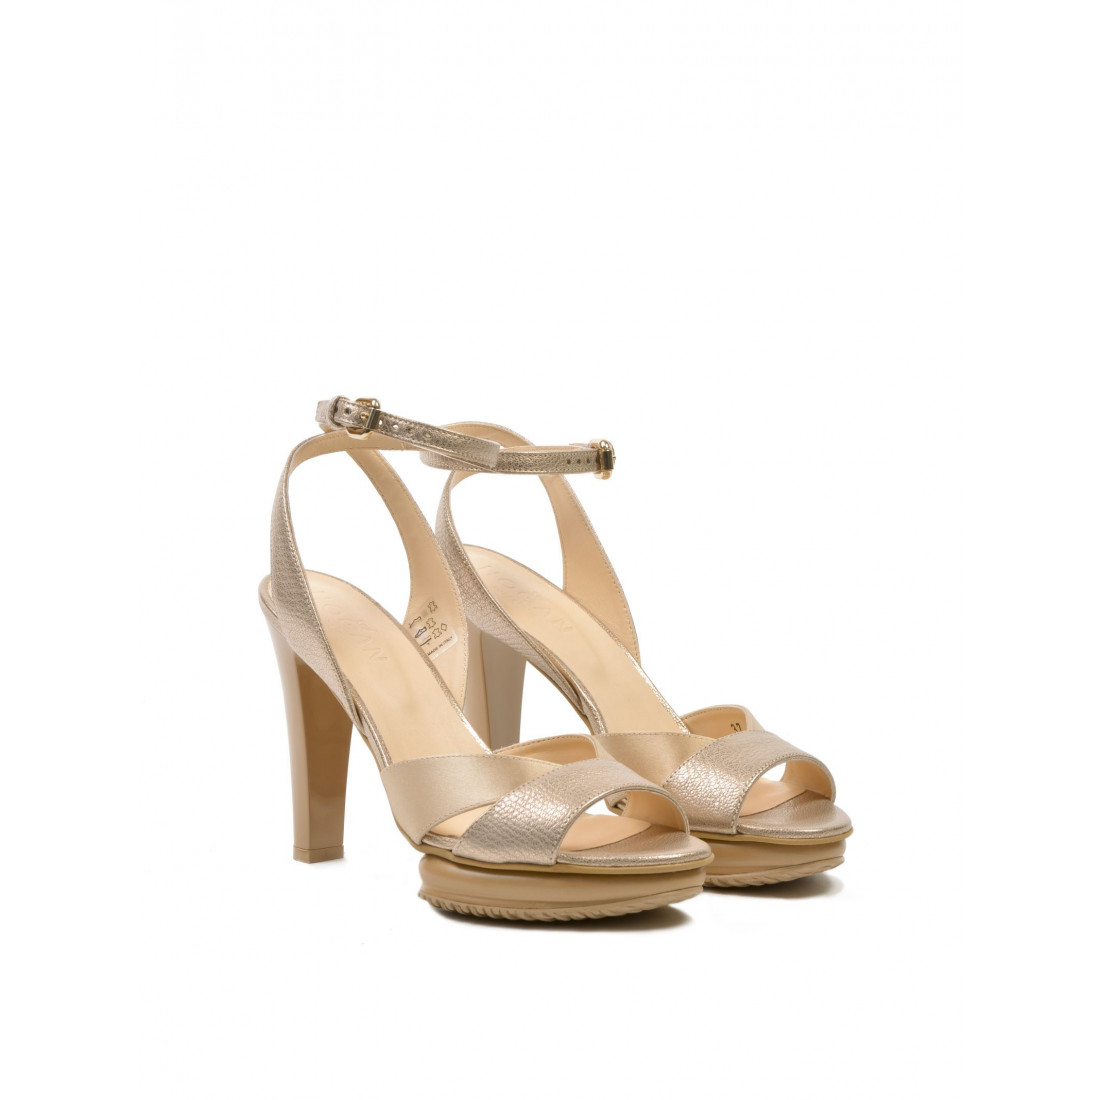 sandals woman hogan hxw2470u830ctl0l65 4084